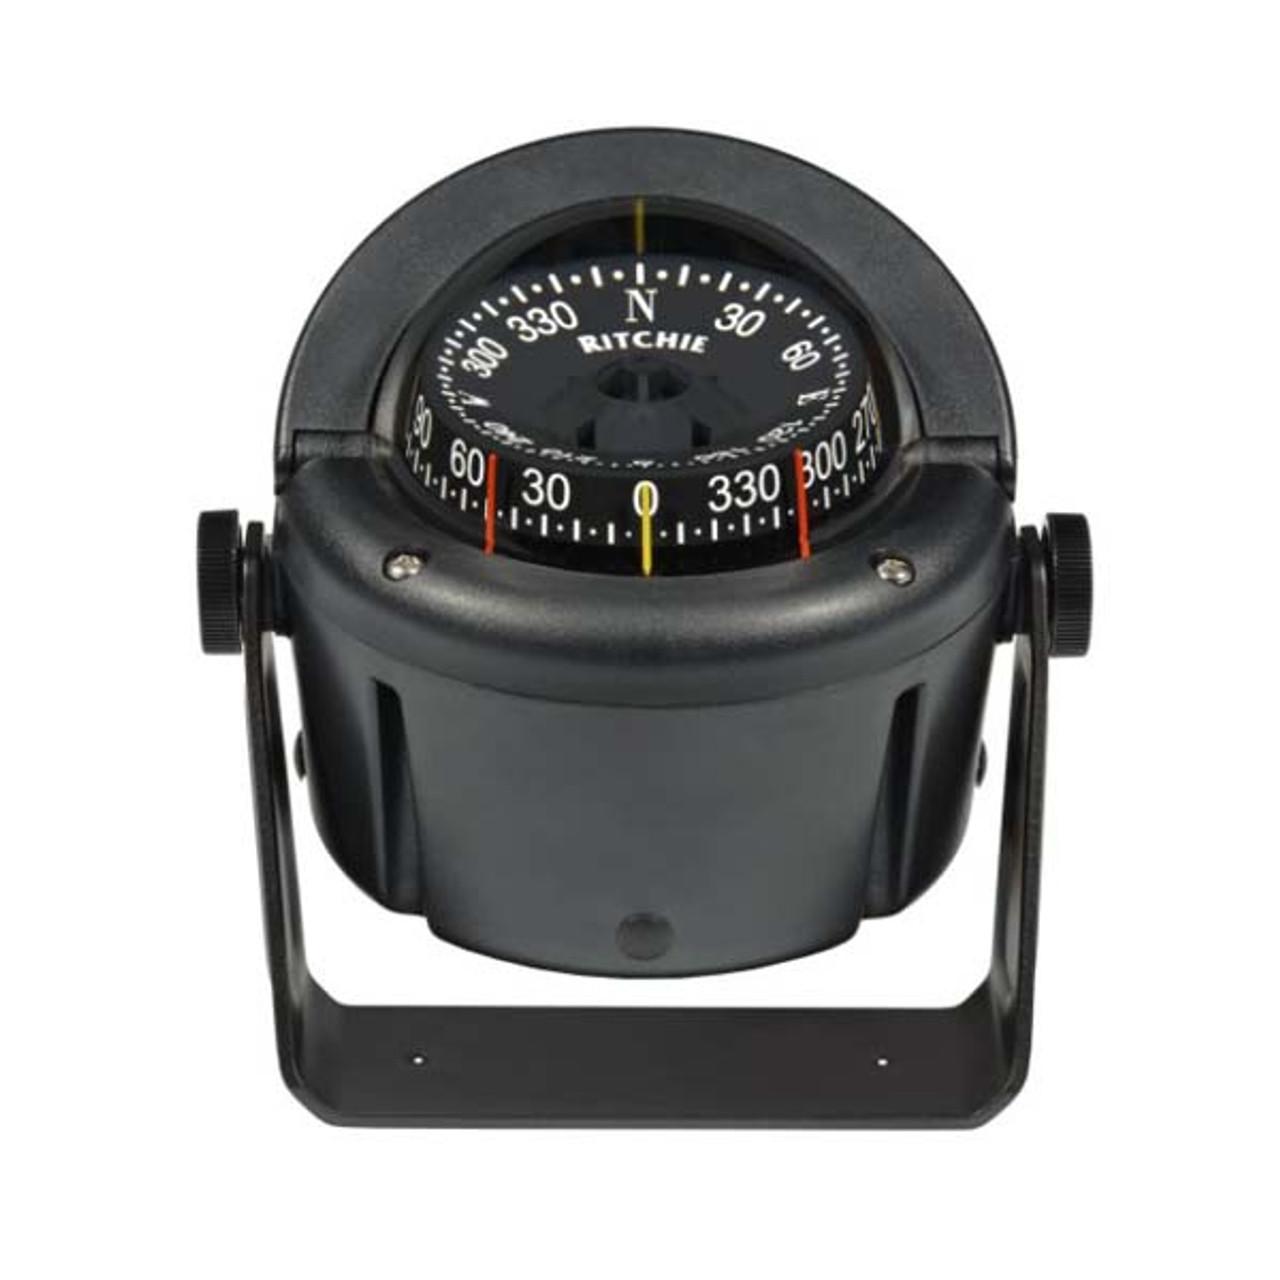 Bracket Mount Black Ritchie B-51 Explorer Compass